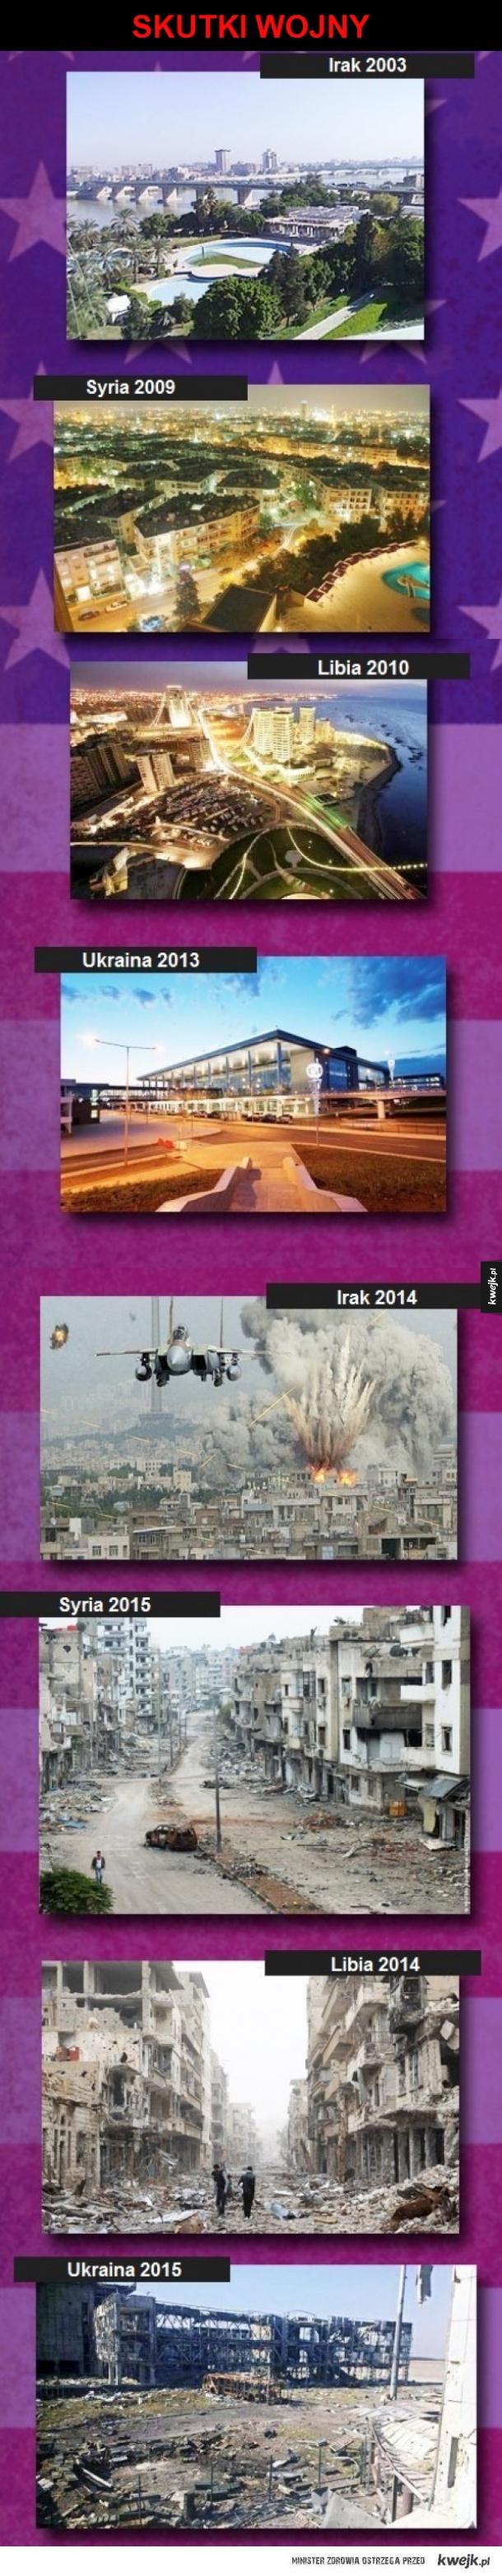 Skutki wojny